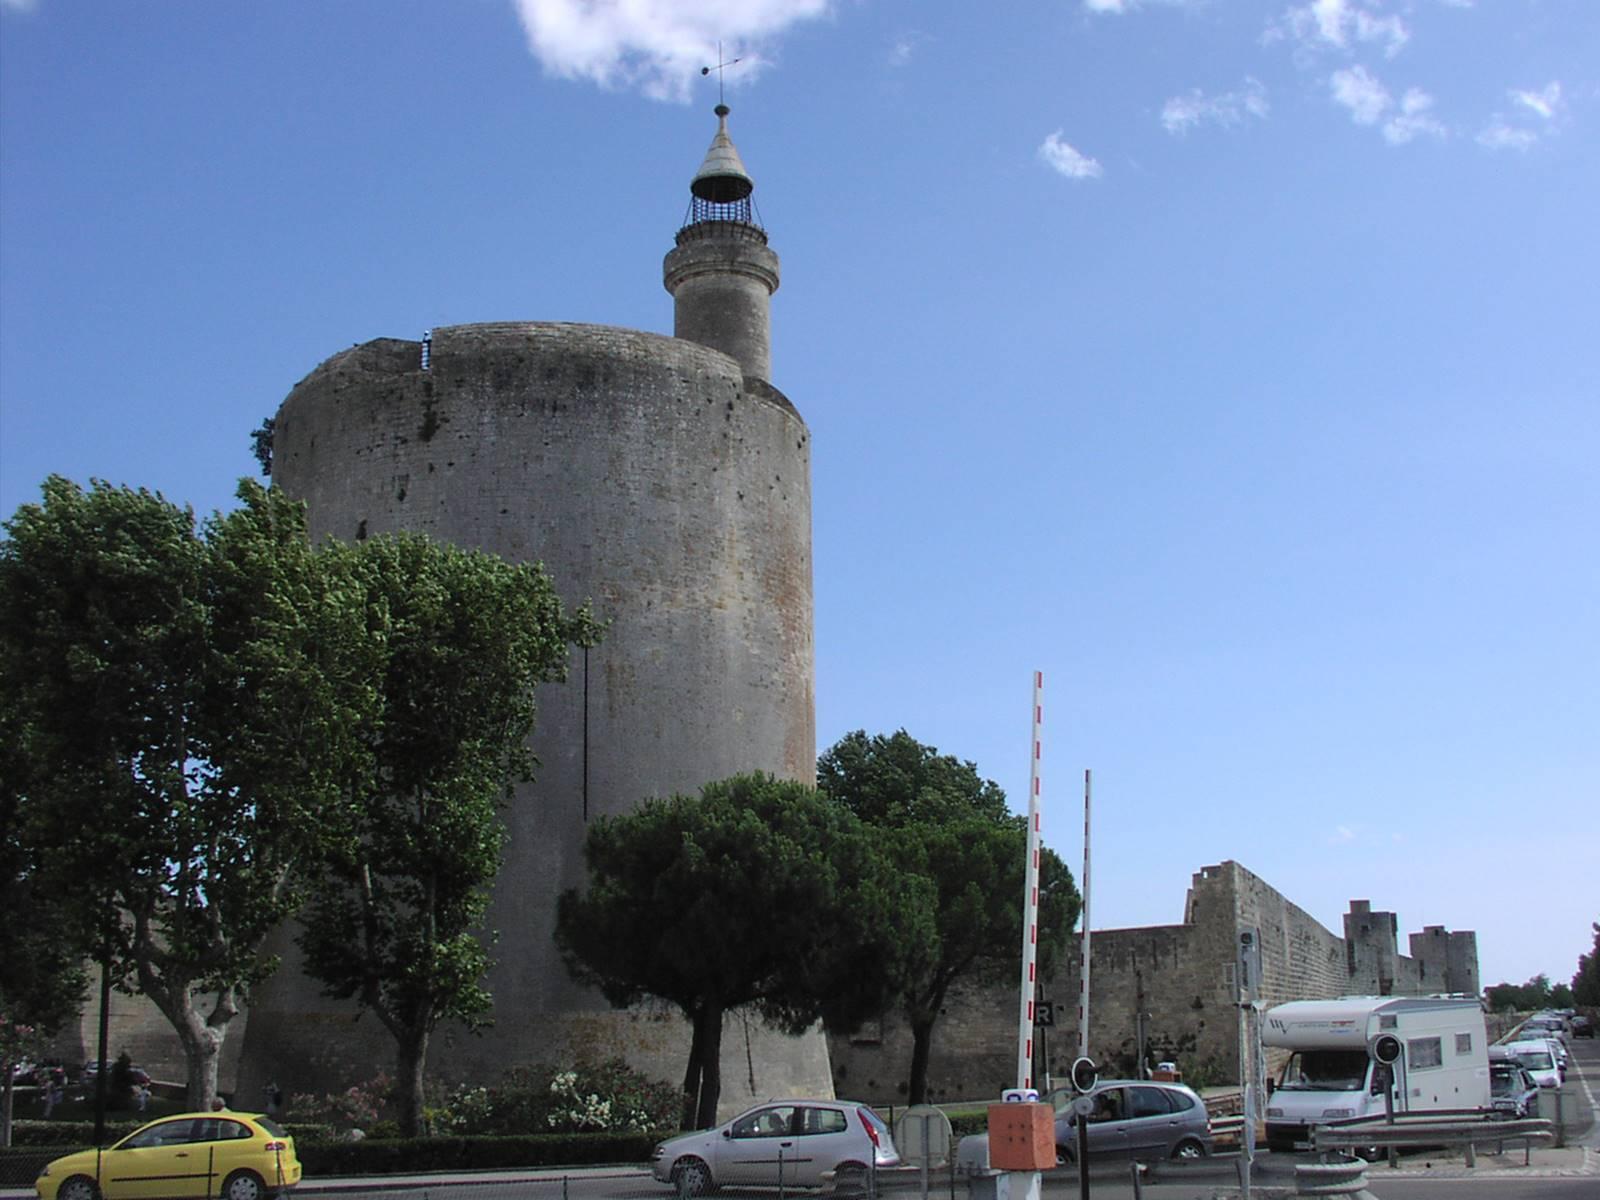 ehem. Gefängnisturm